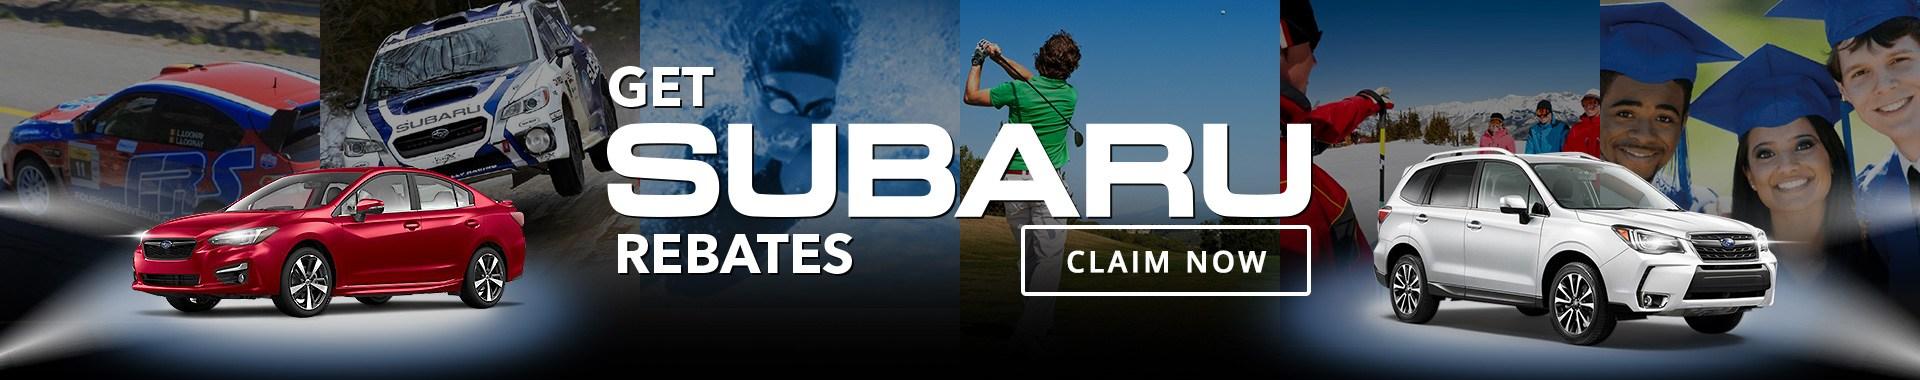 Willowdale Subaru | Toronto Subaru Rebates for Grads